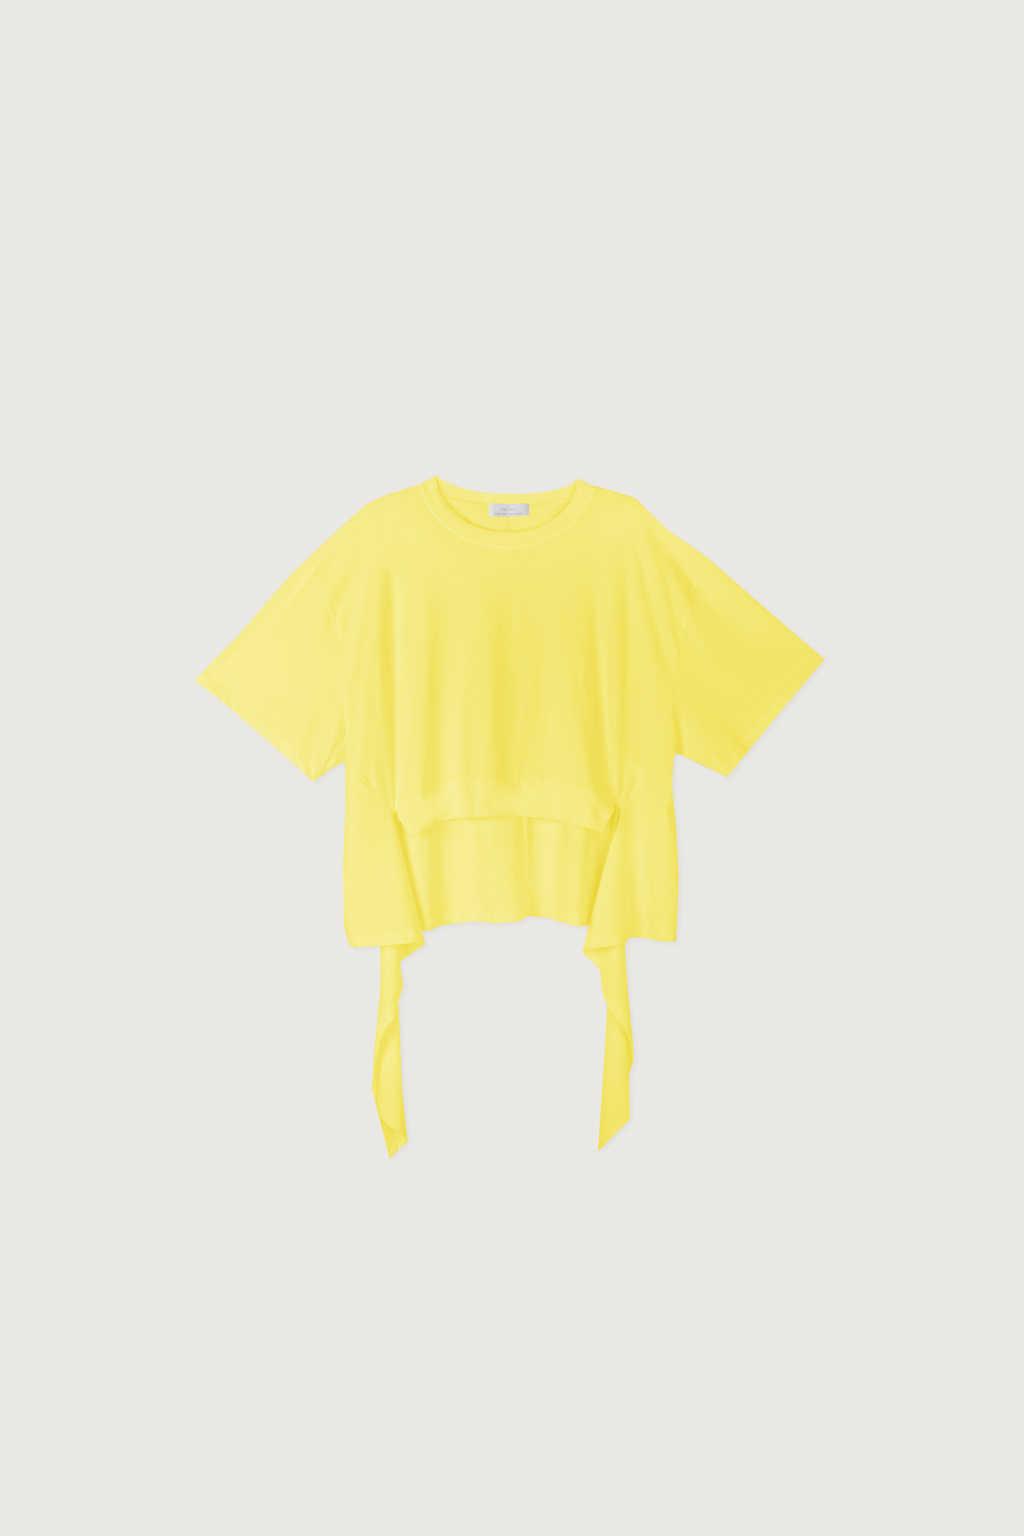 TShirt K151 Yellow 5